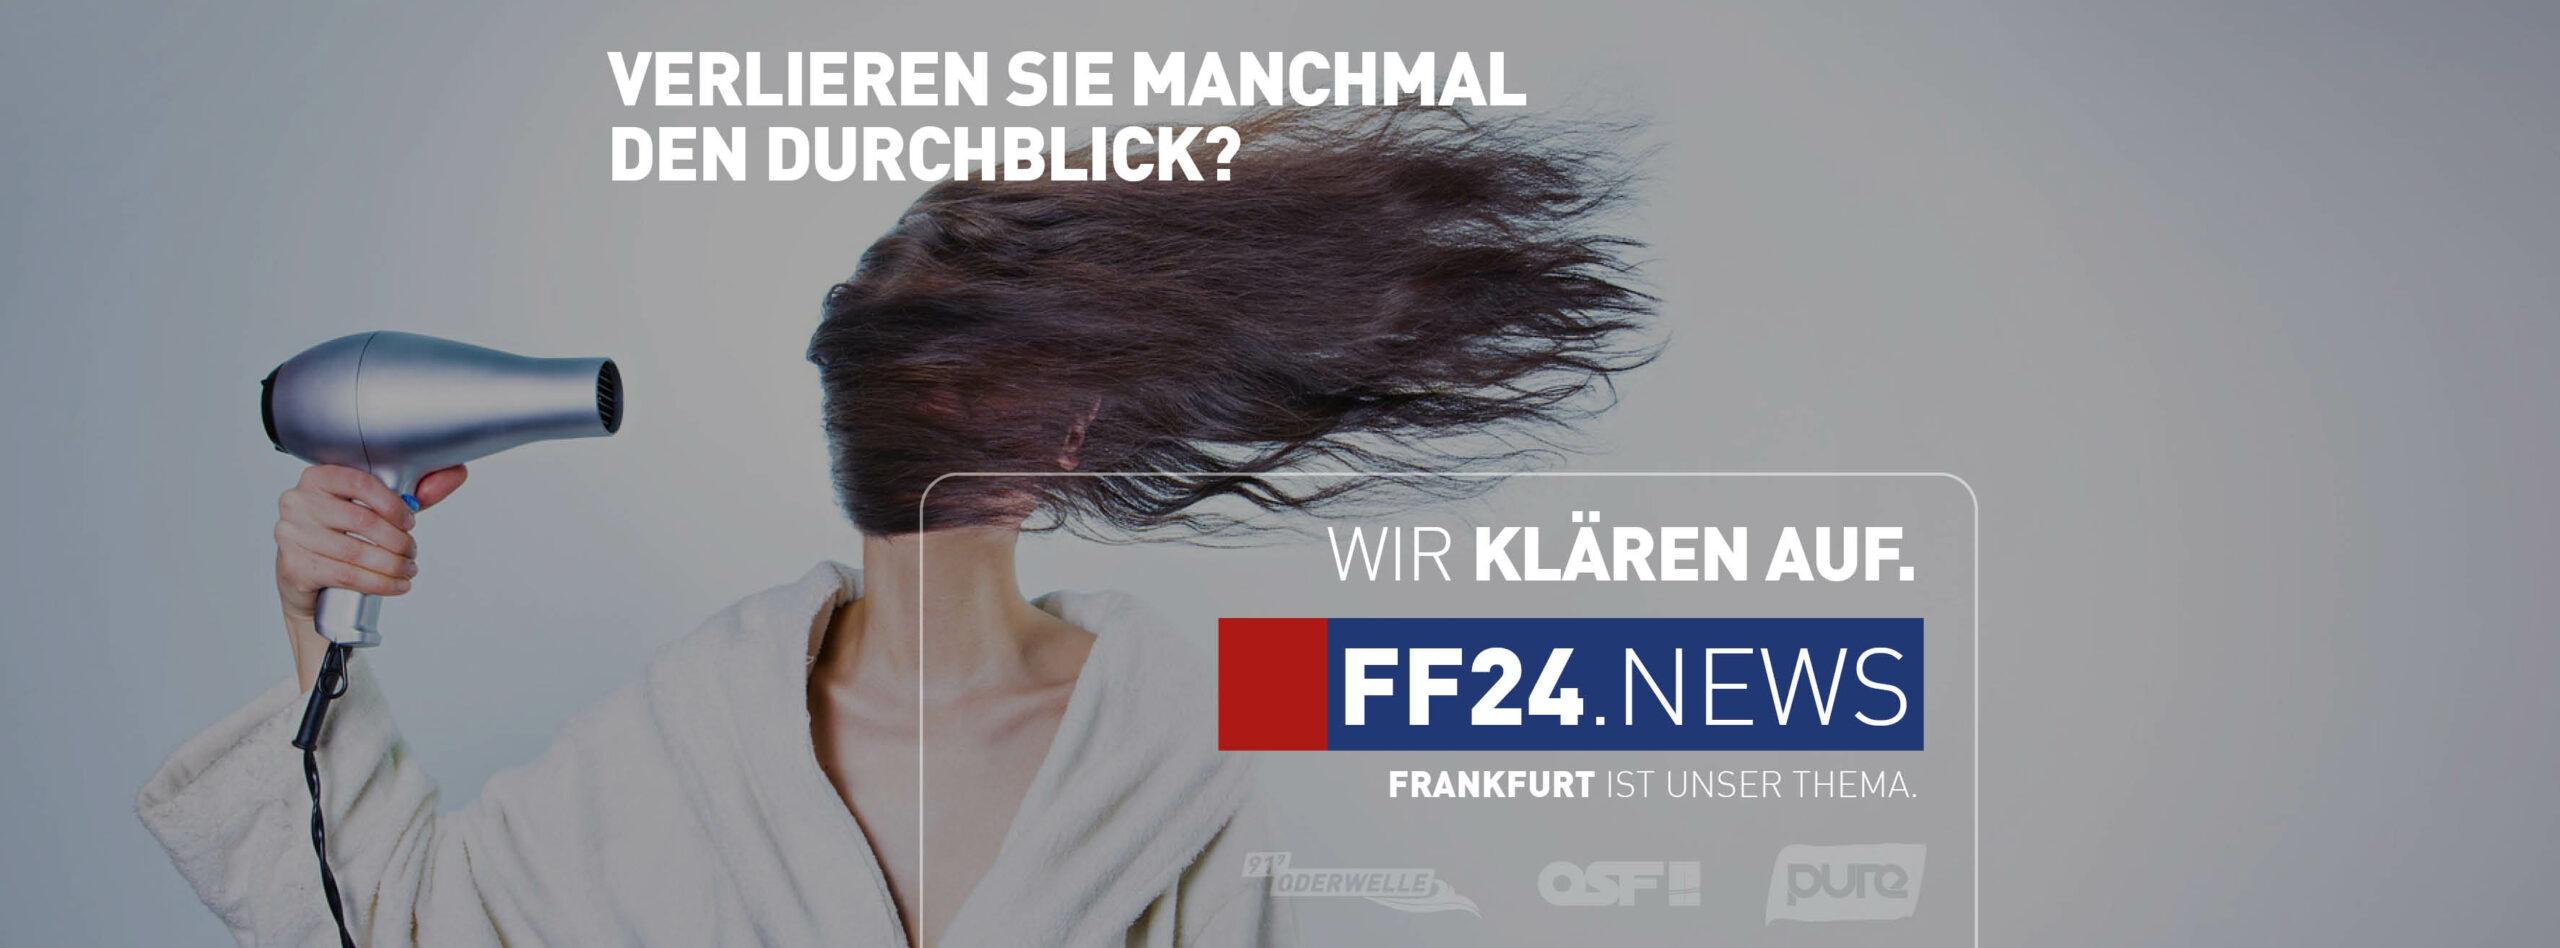 http://www.ff24.news/wp-content/uploads/21-03-27-ff24-fb-kampagne-durchblick-scaled.jpg